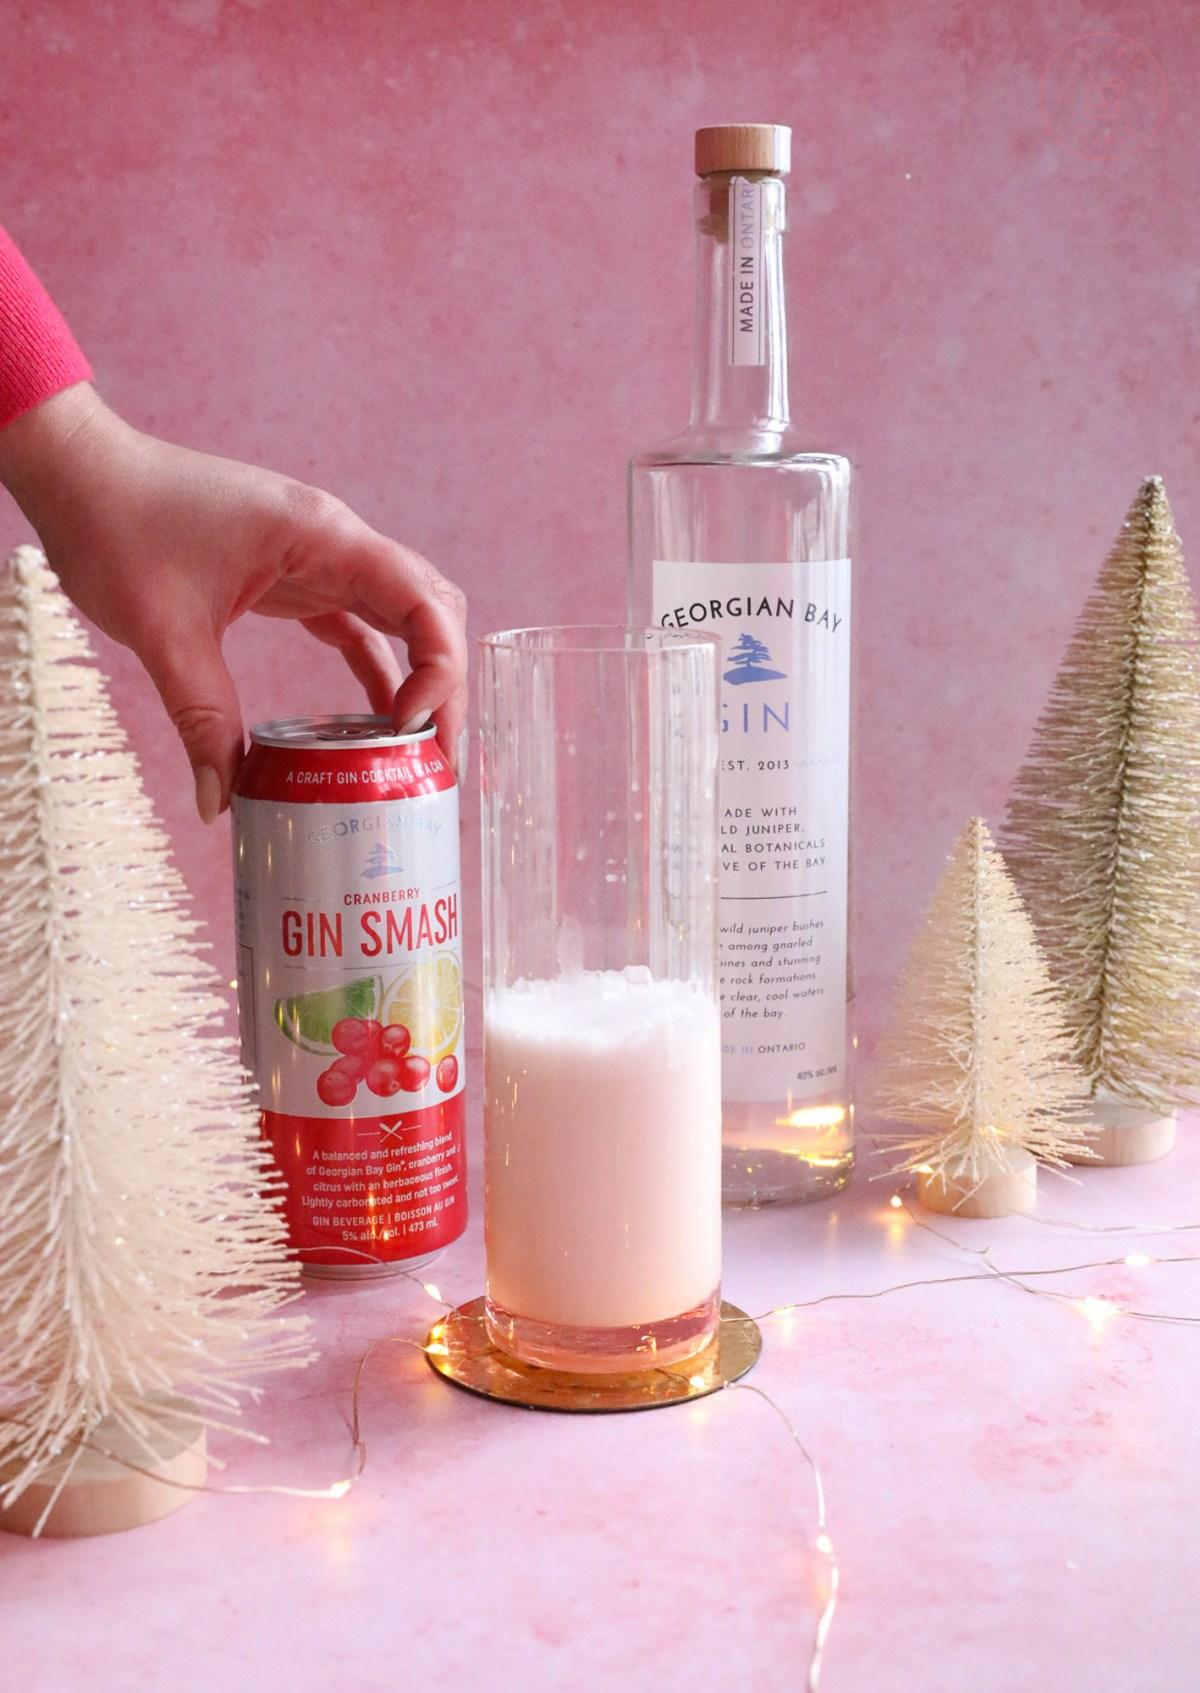 Comet's Gin Fizz - Georgian Bay Cranberry Gin Smash   Taste and Tipple